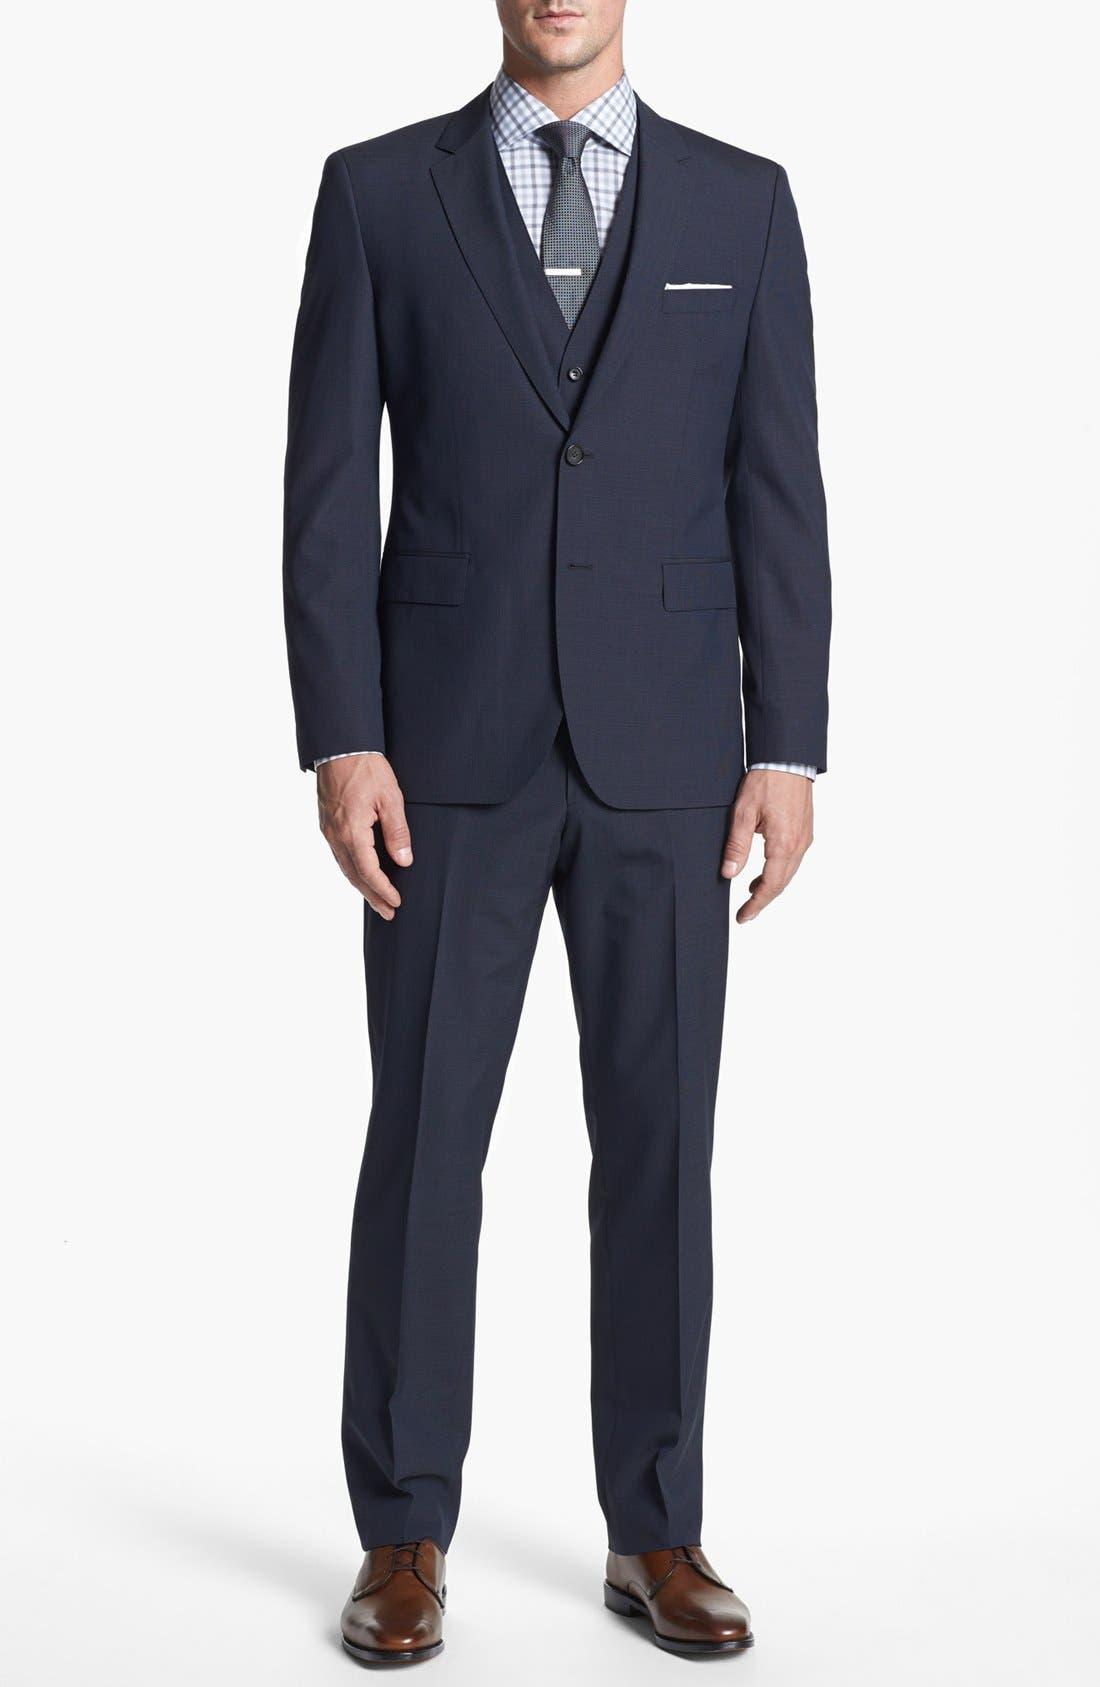 Alternate Image 1 Selected - BOSS HUGO BOSS 'James/Sharp' Trim Fit Three-Piece Suit